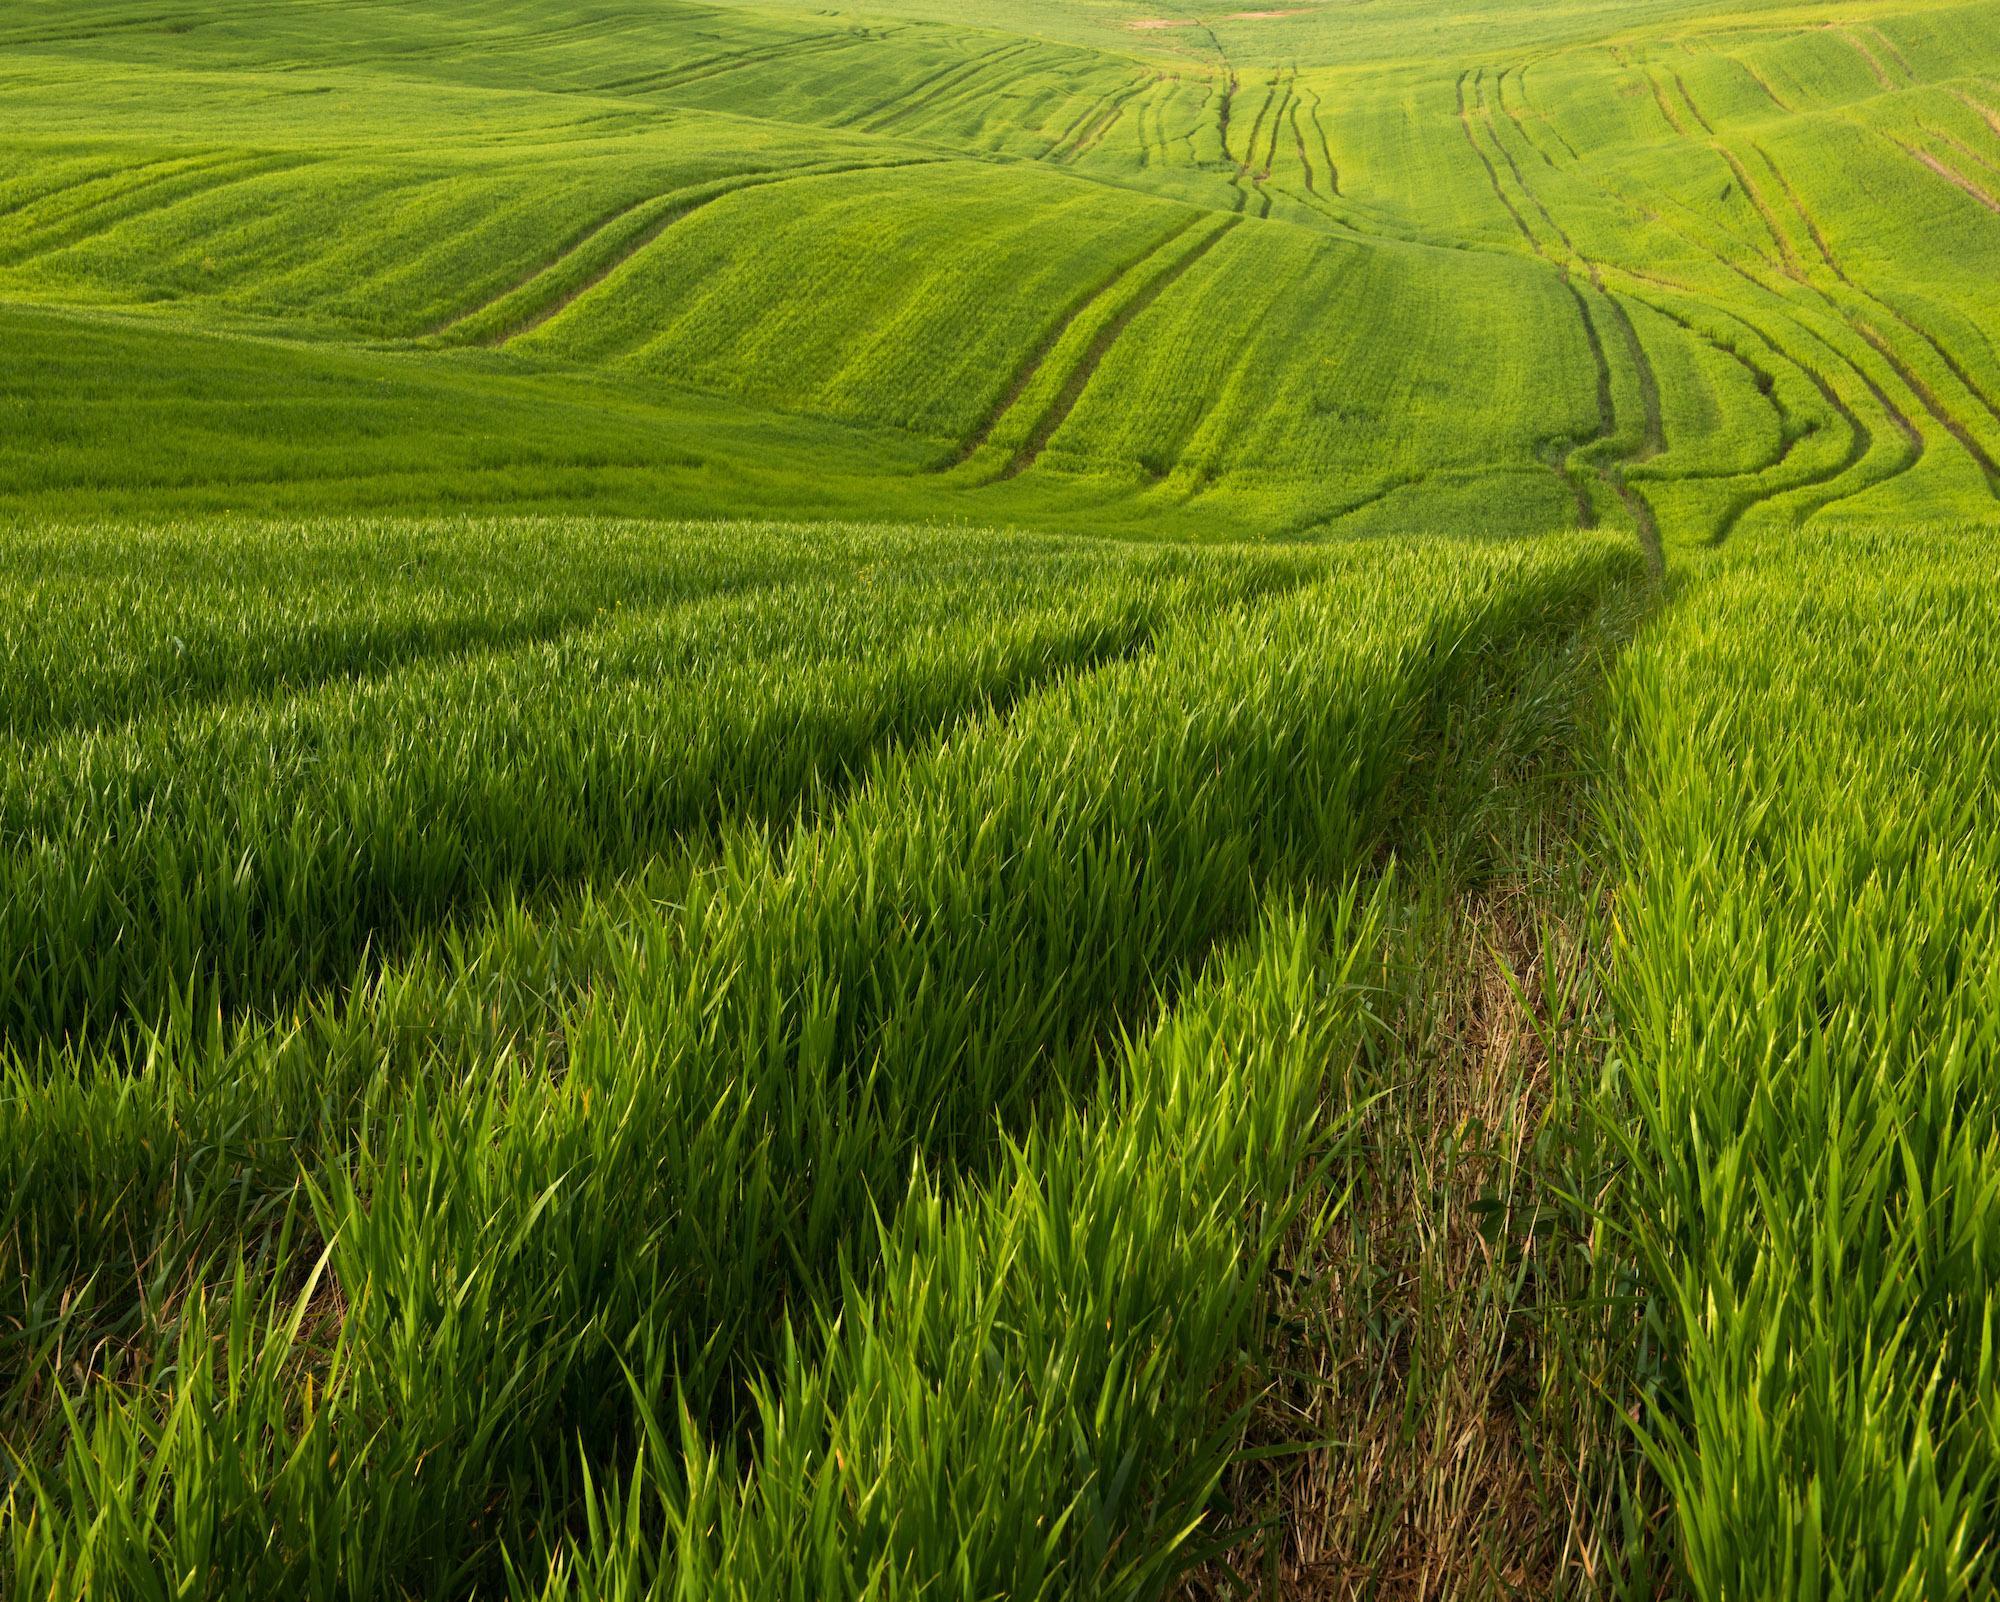 by Daniel Kordan - Spring Tuscany